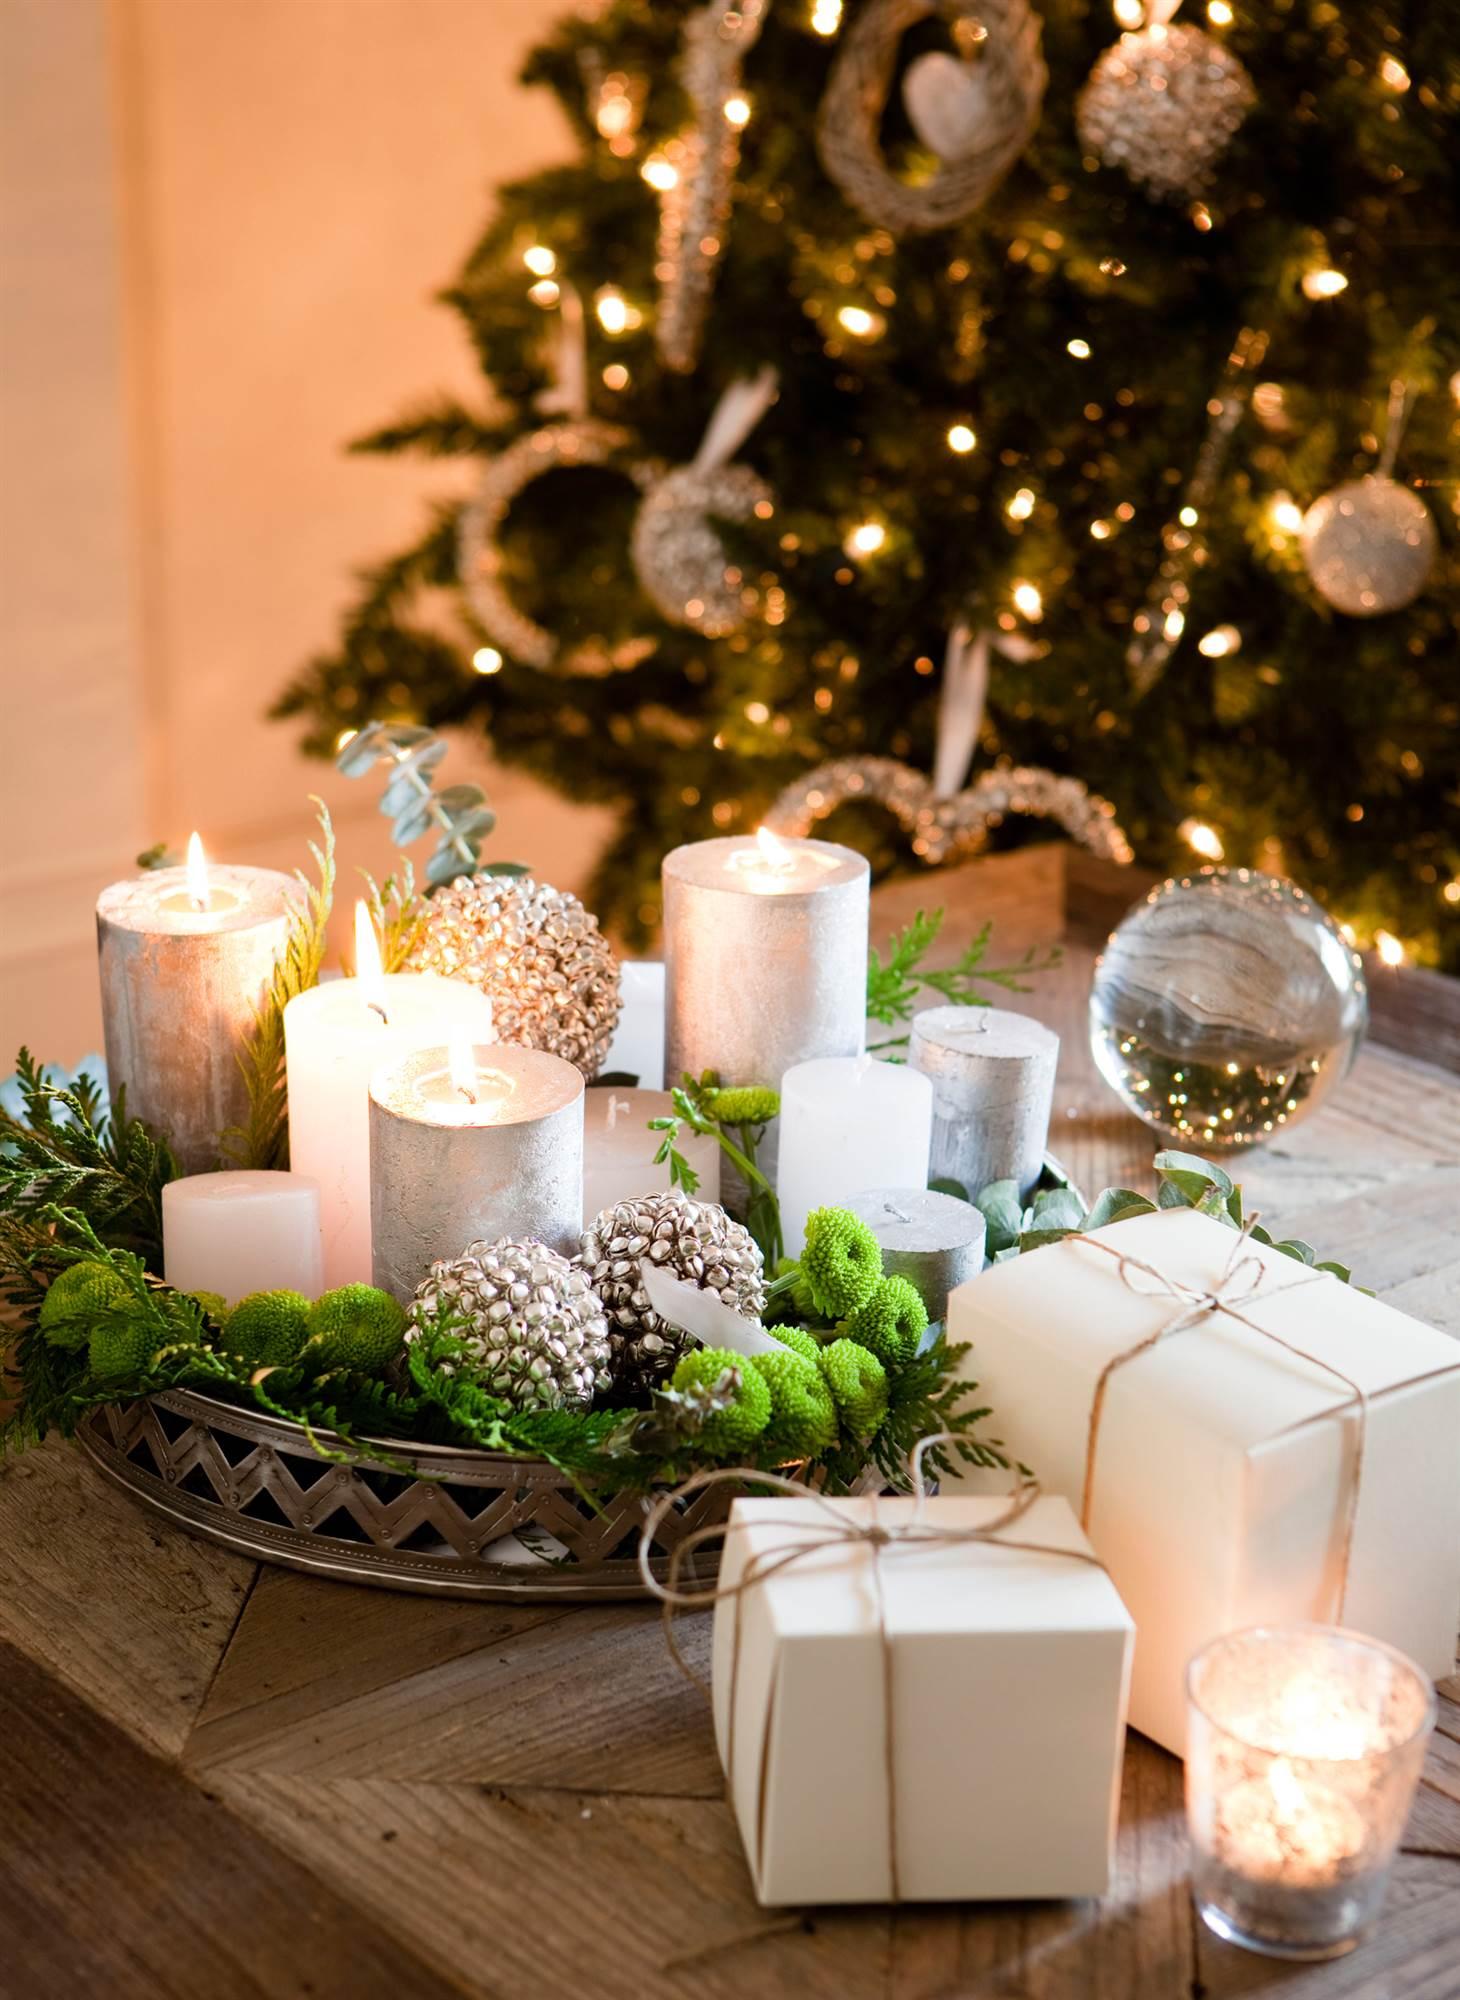 M s de 30 detalles para llenar de magia tu casa esta navidad for Como adornar mi casa en navidad